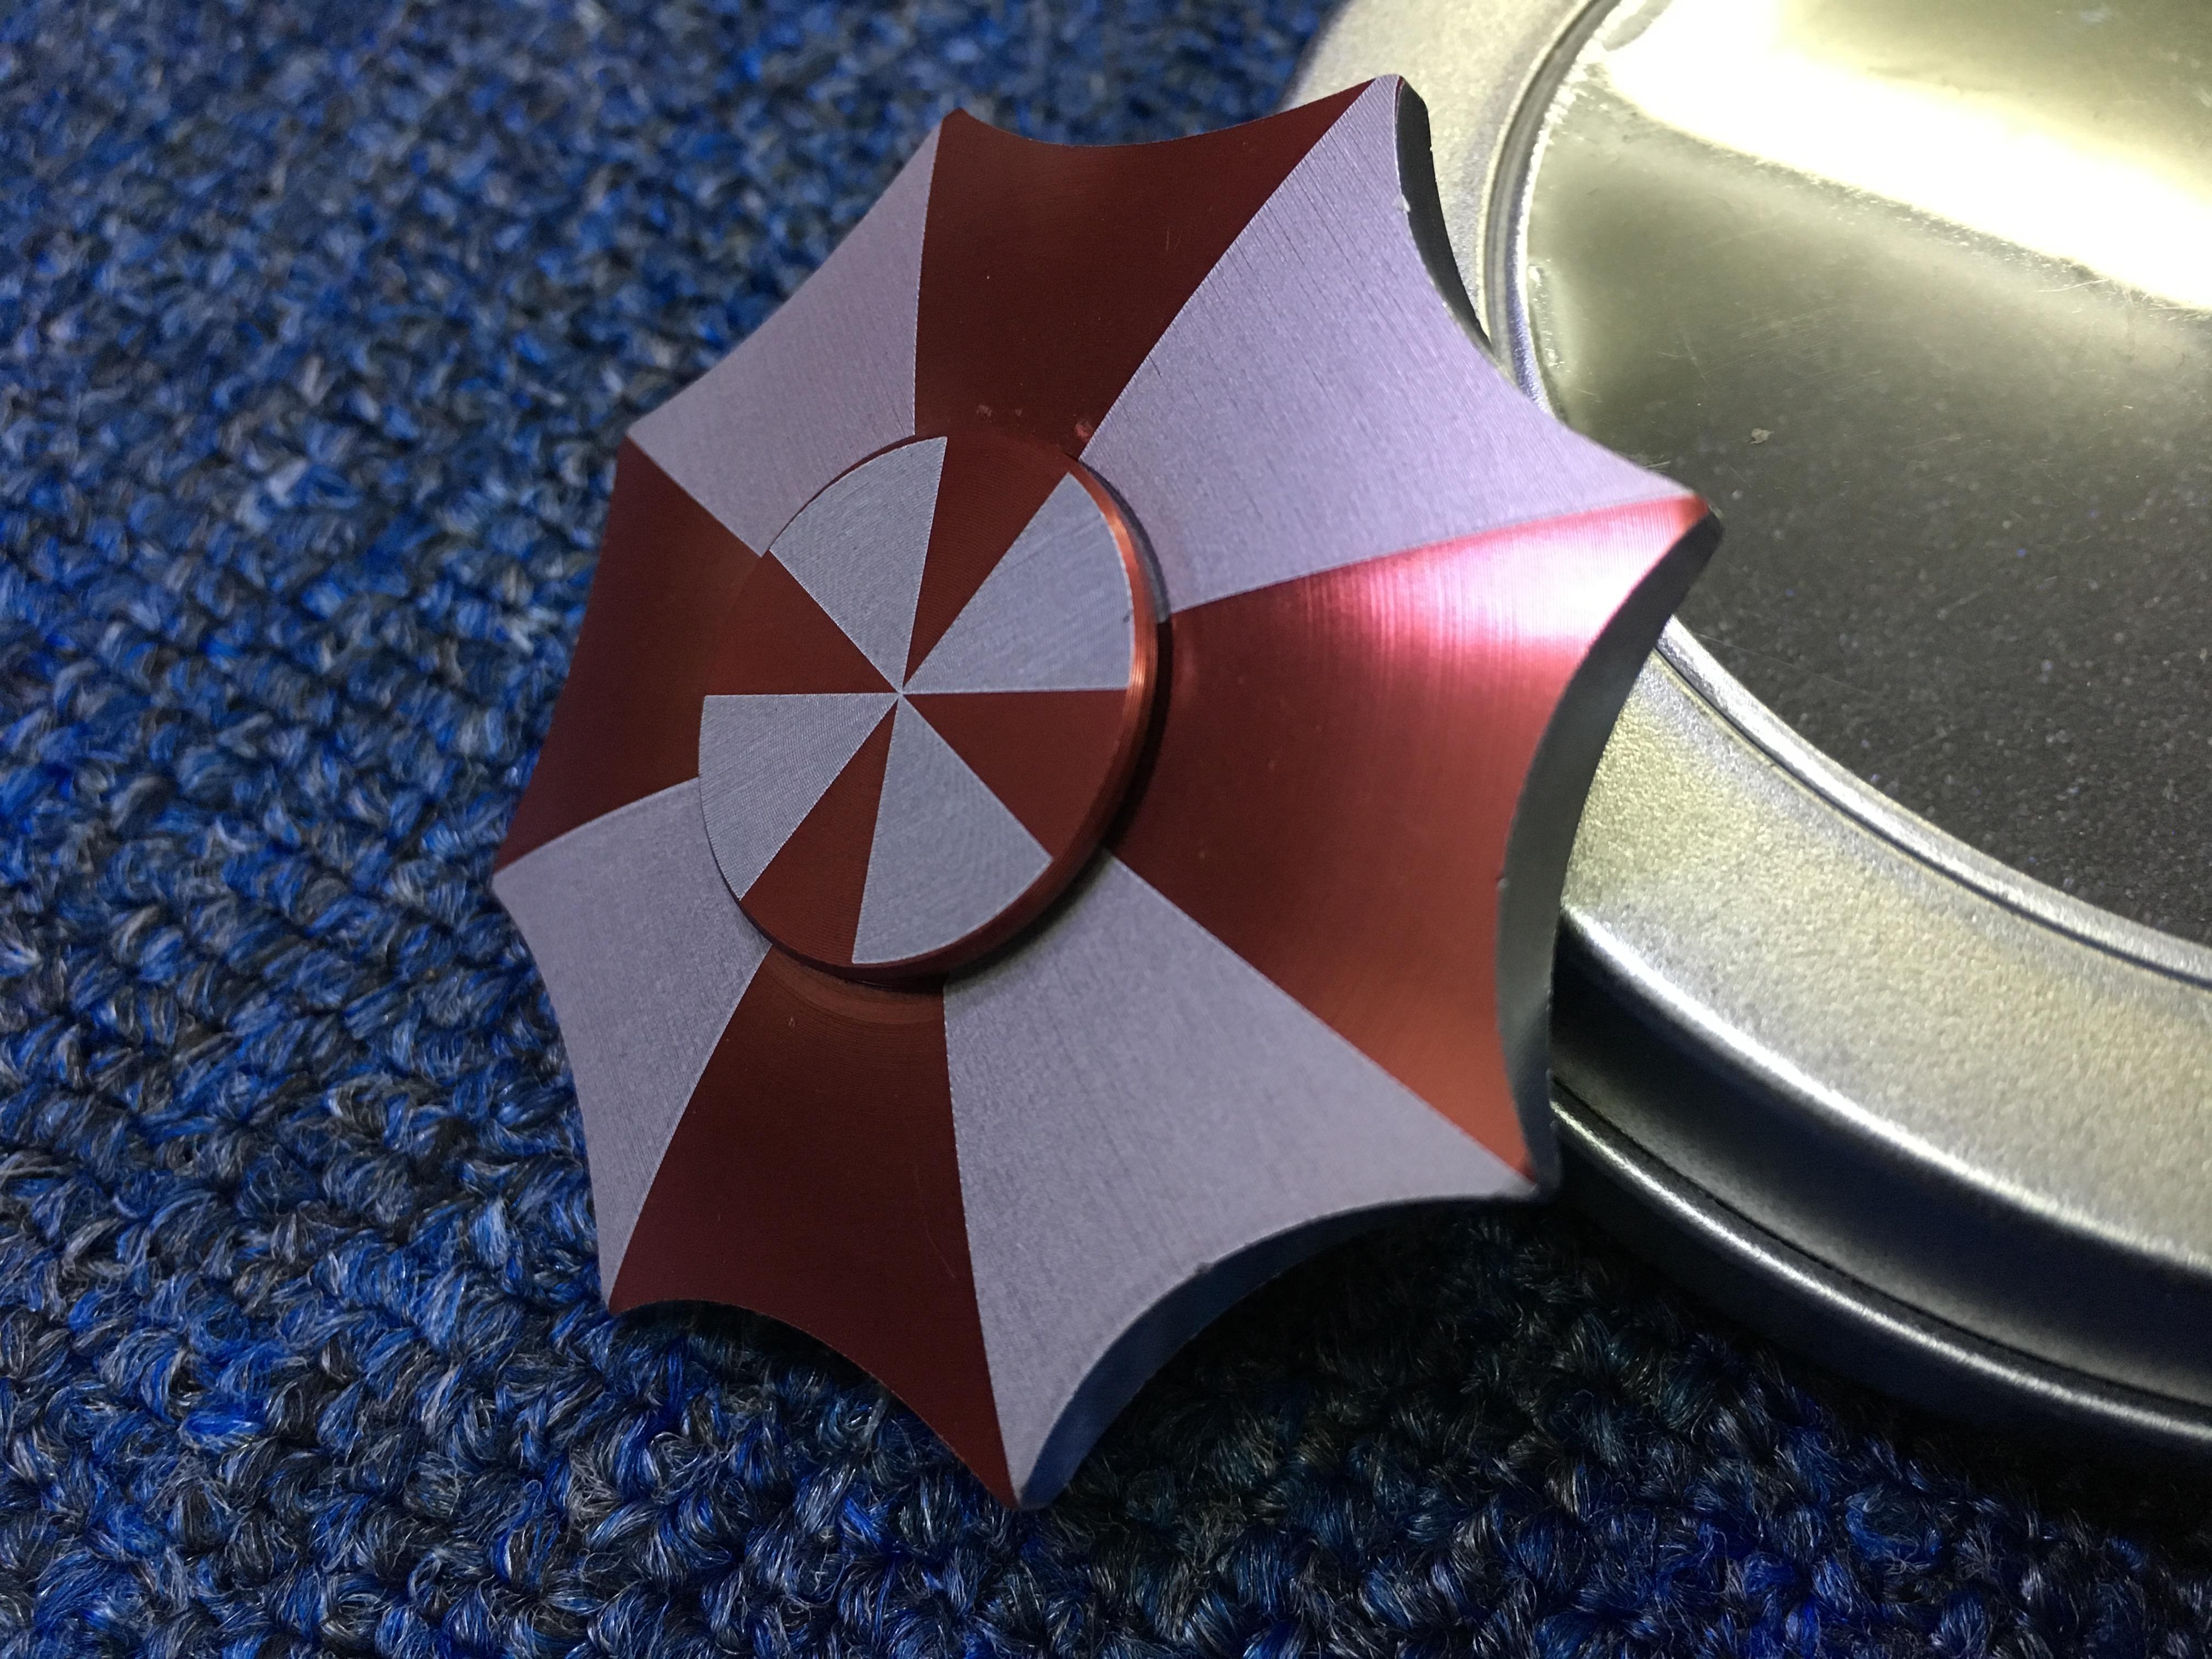 Con Quay Giảm Stress Iron Man 2 Hand Spinner - Fidget Spinner